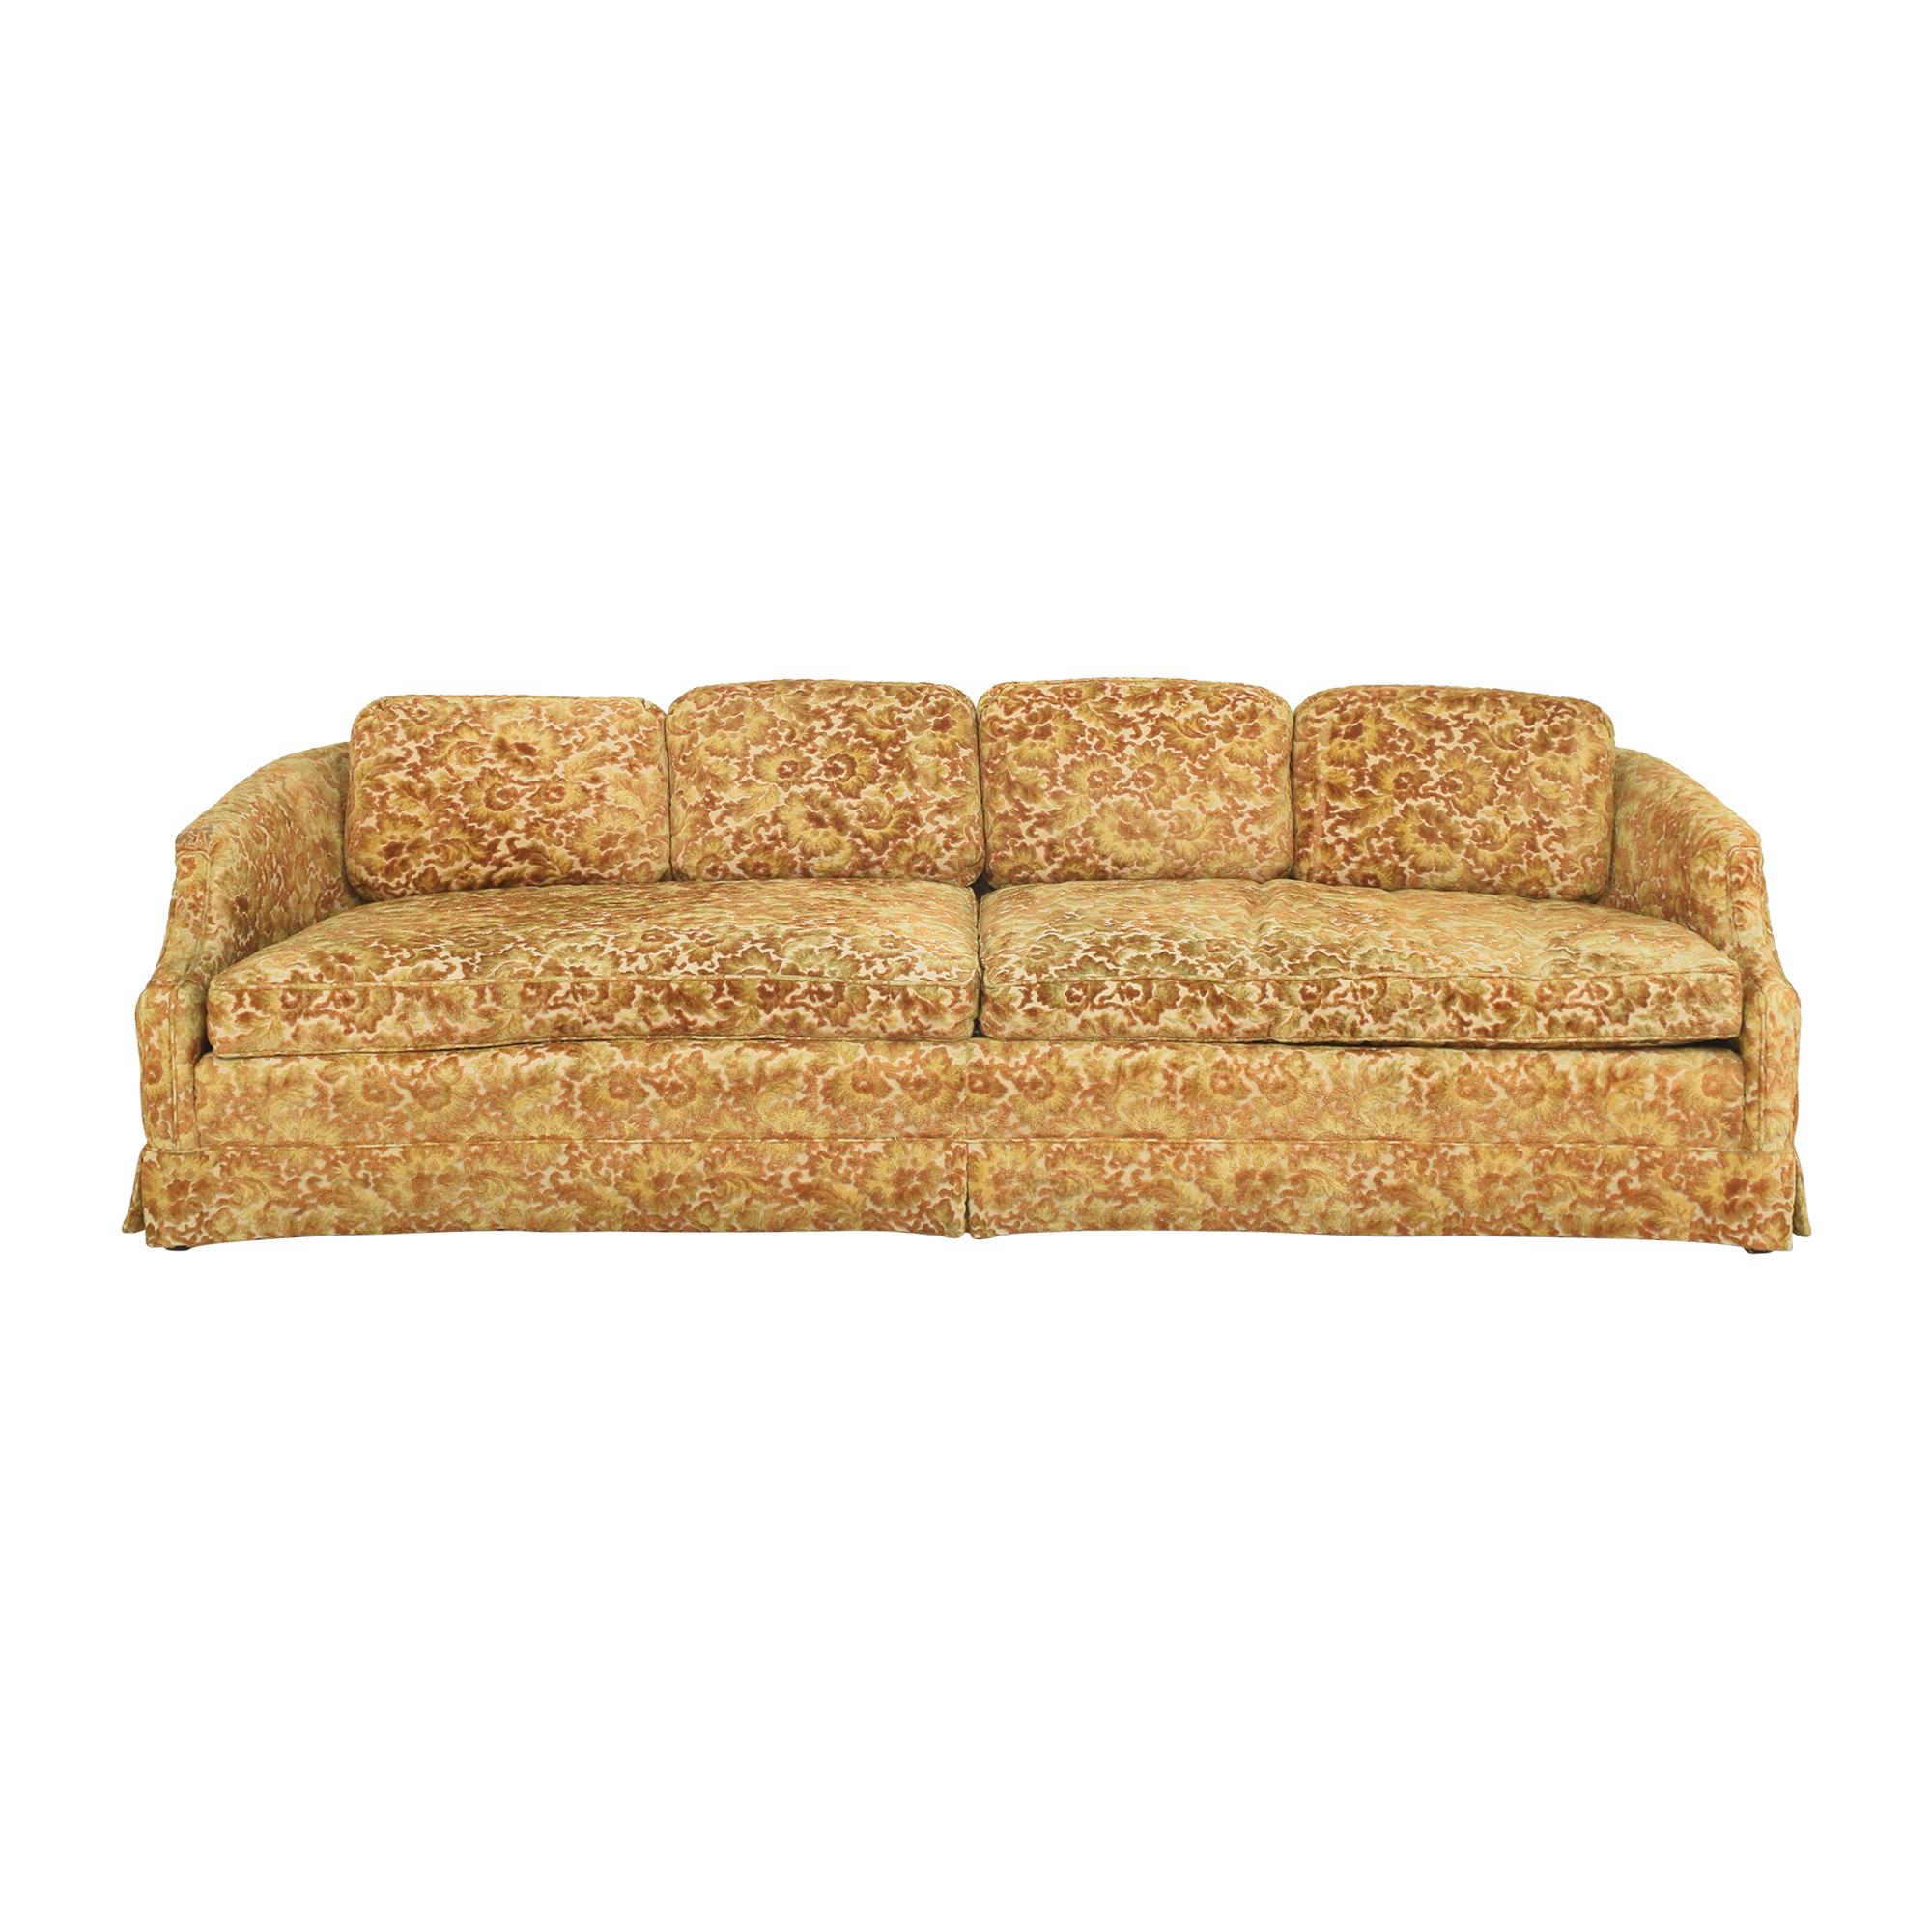 buy Sherrill Furniture Floral Skirted Sofa Sherrill Furniture